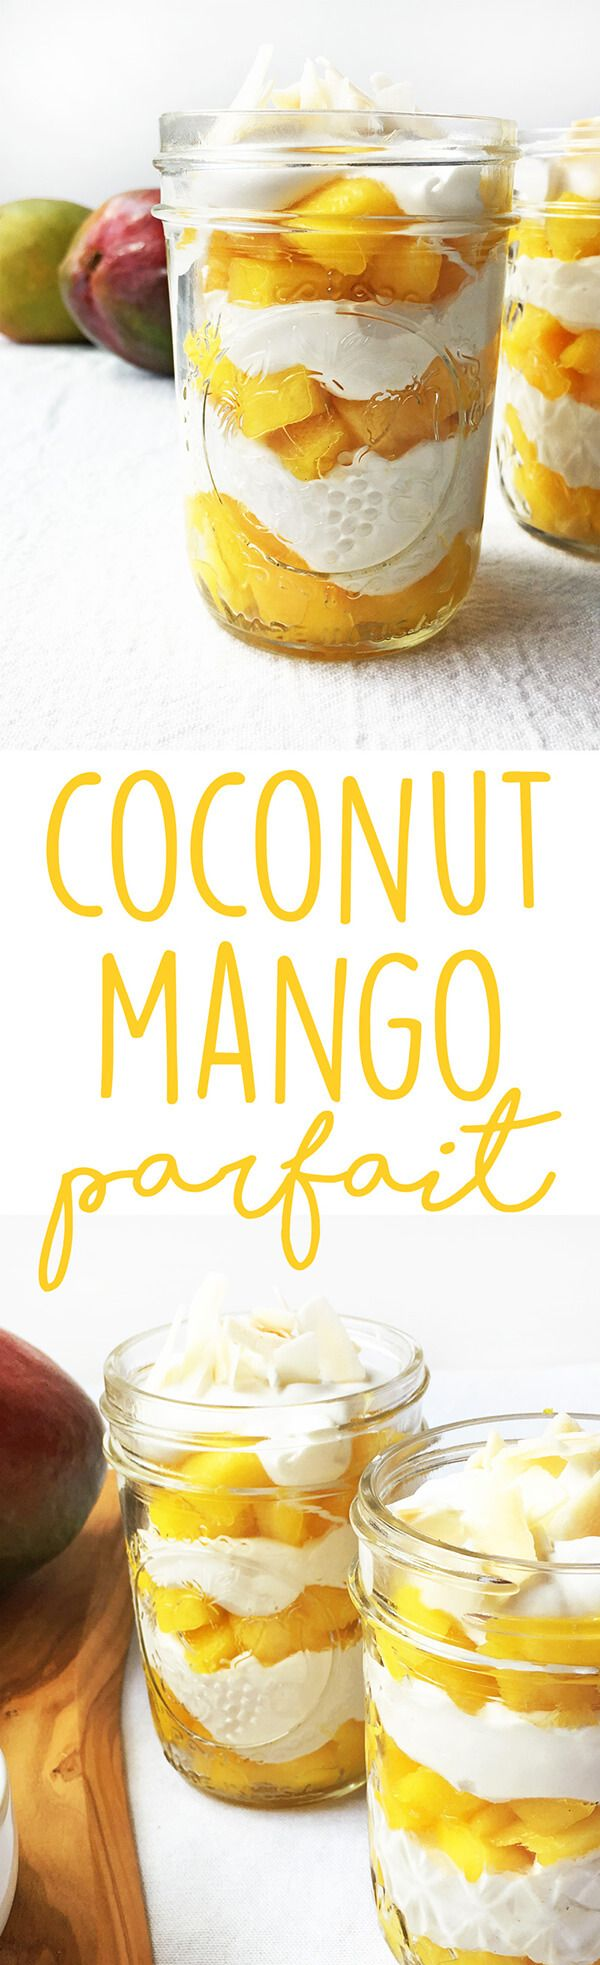 Coconut Mango Parfait - a healthy vegan breakfast or dessert recipe, bursting with tropical flavors. | thecrunchychronicles.com via @thecrunchychron